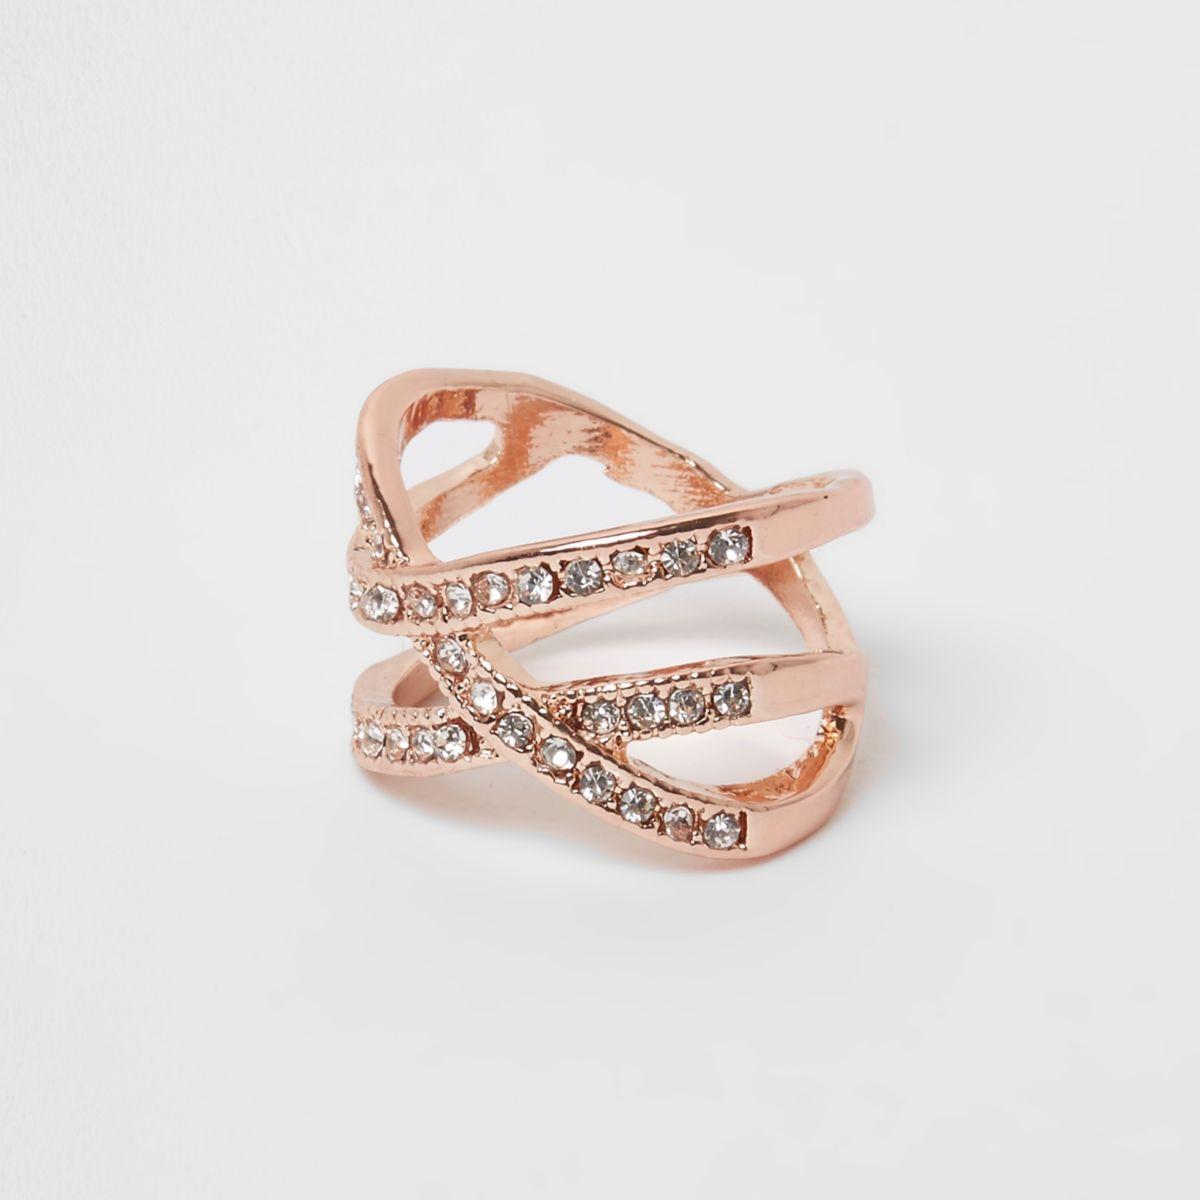 Rose gold tone diamante encrusted cross ring